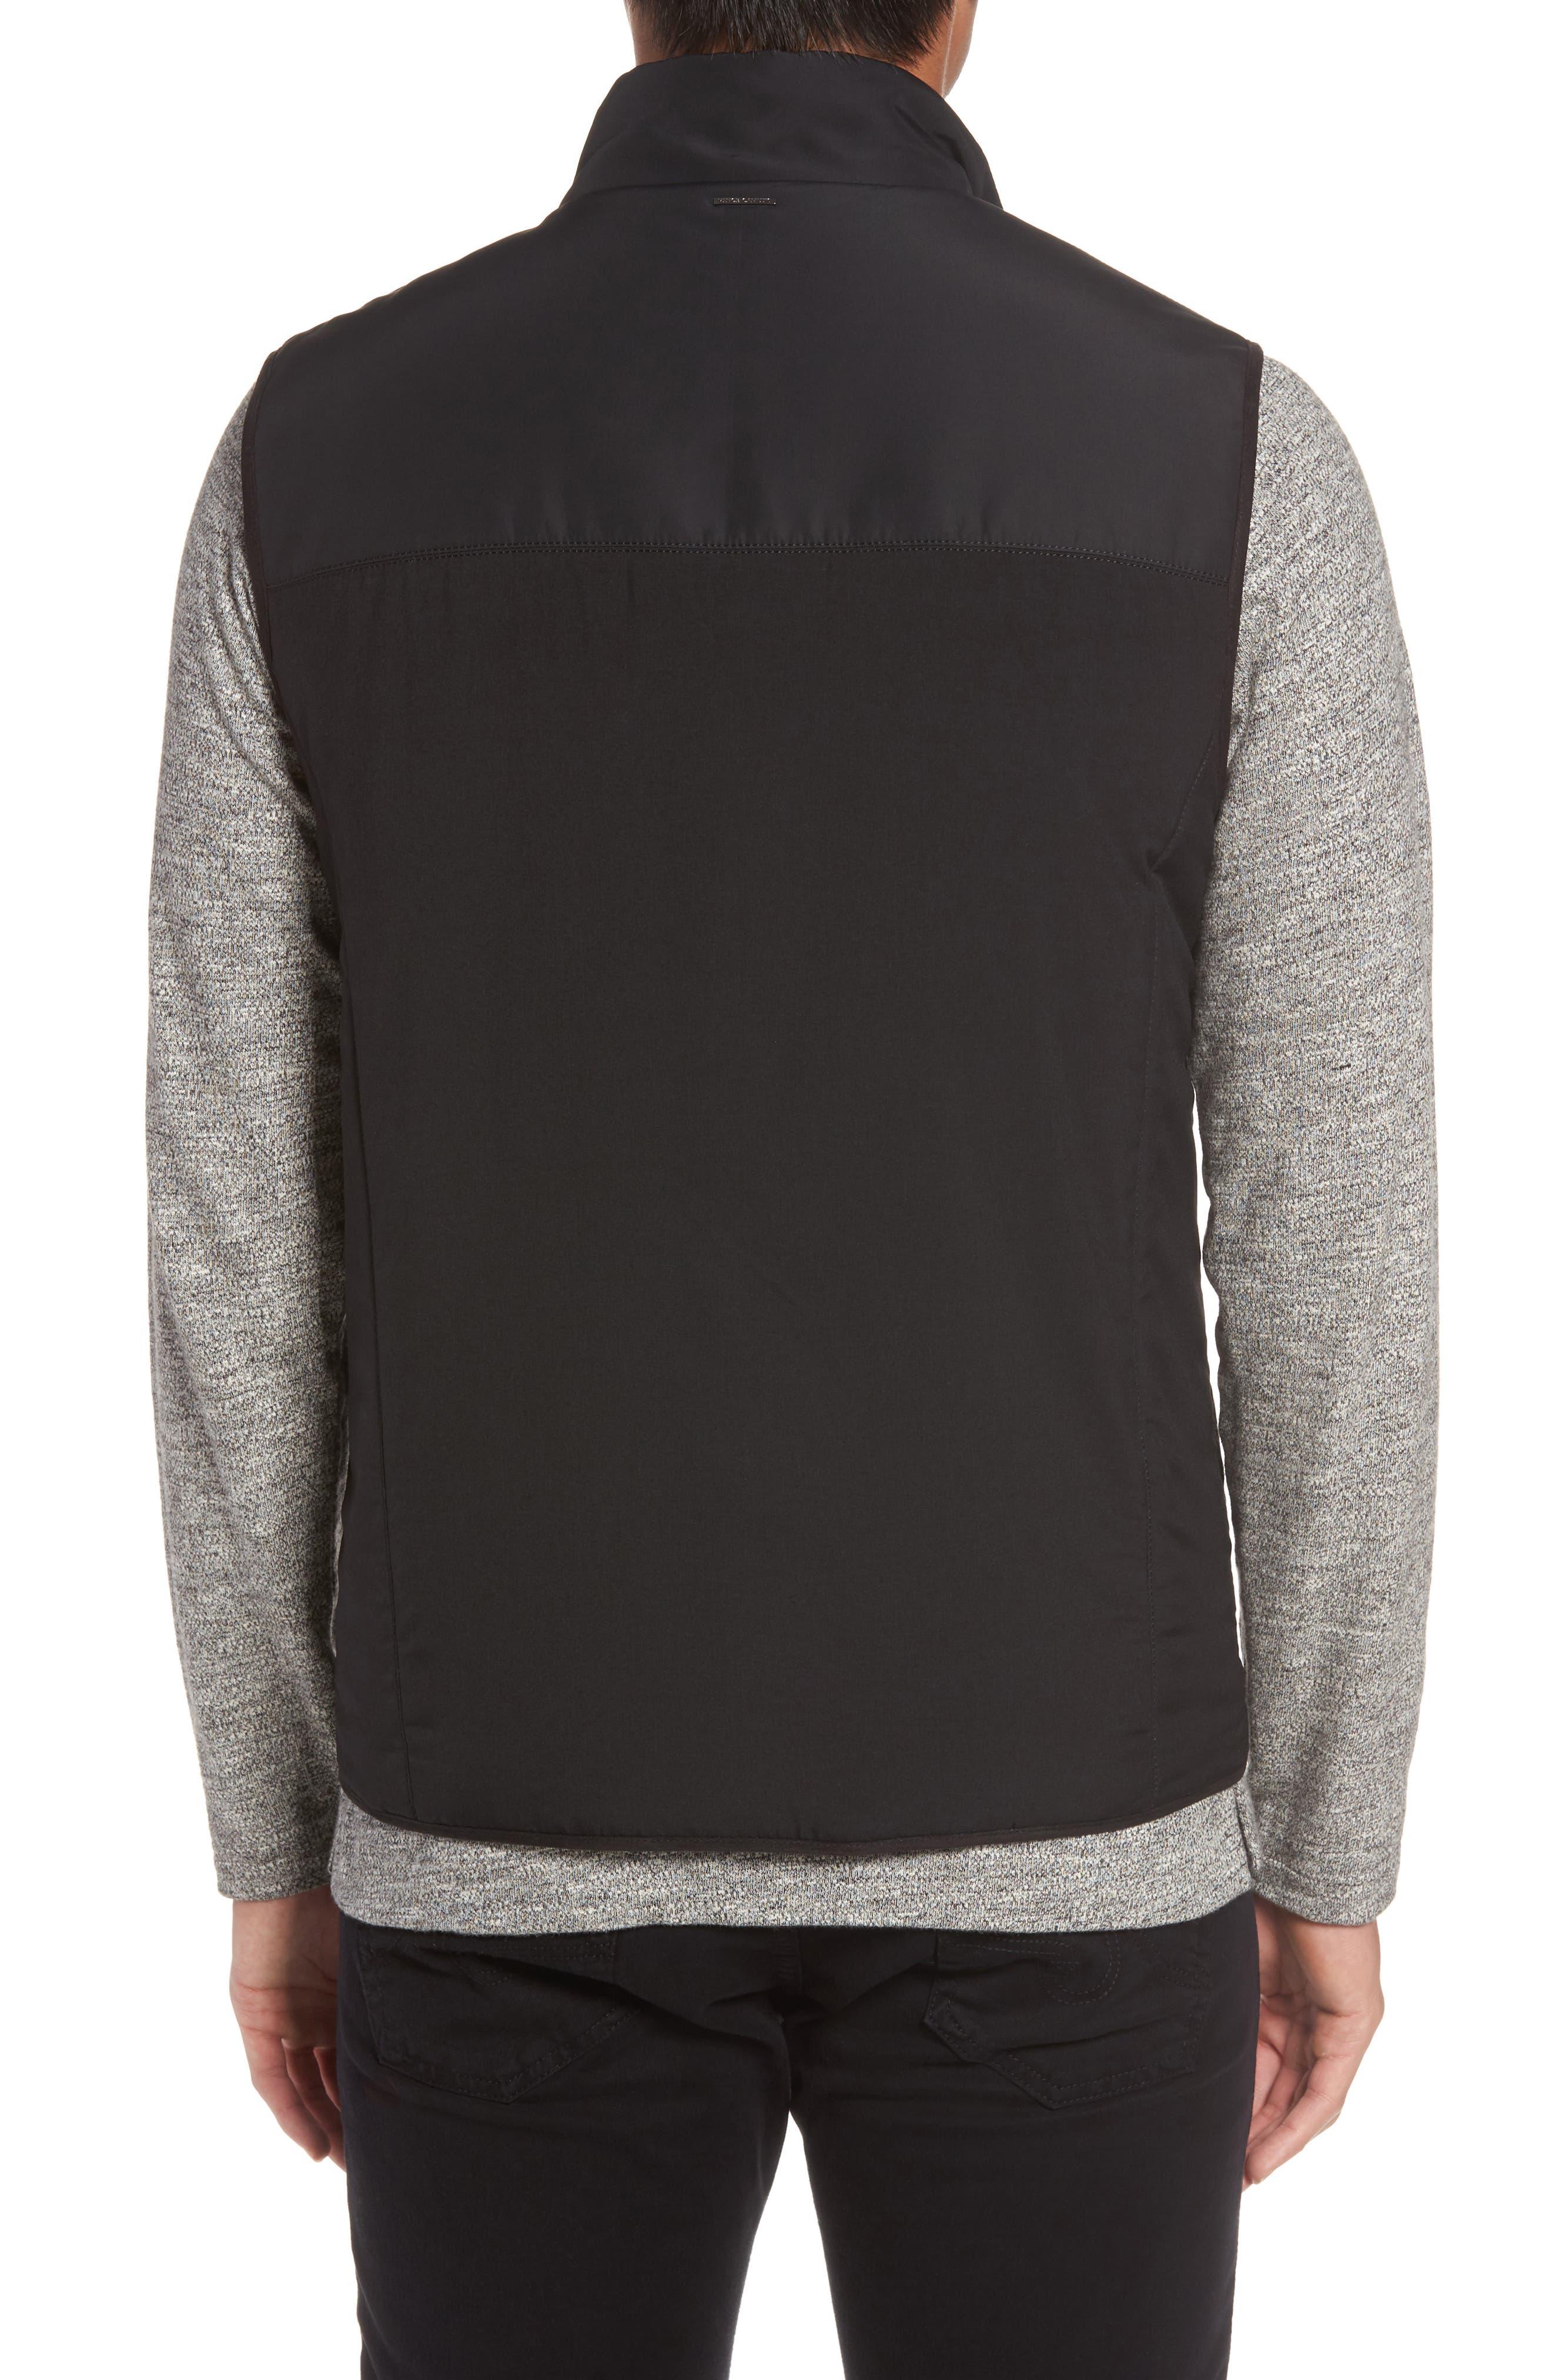 VINCE CAMUTO,                             Slim Fit Quilted Vest,                             Alternate thumbnail 2, color,                             BLACK